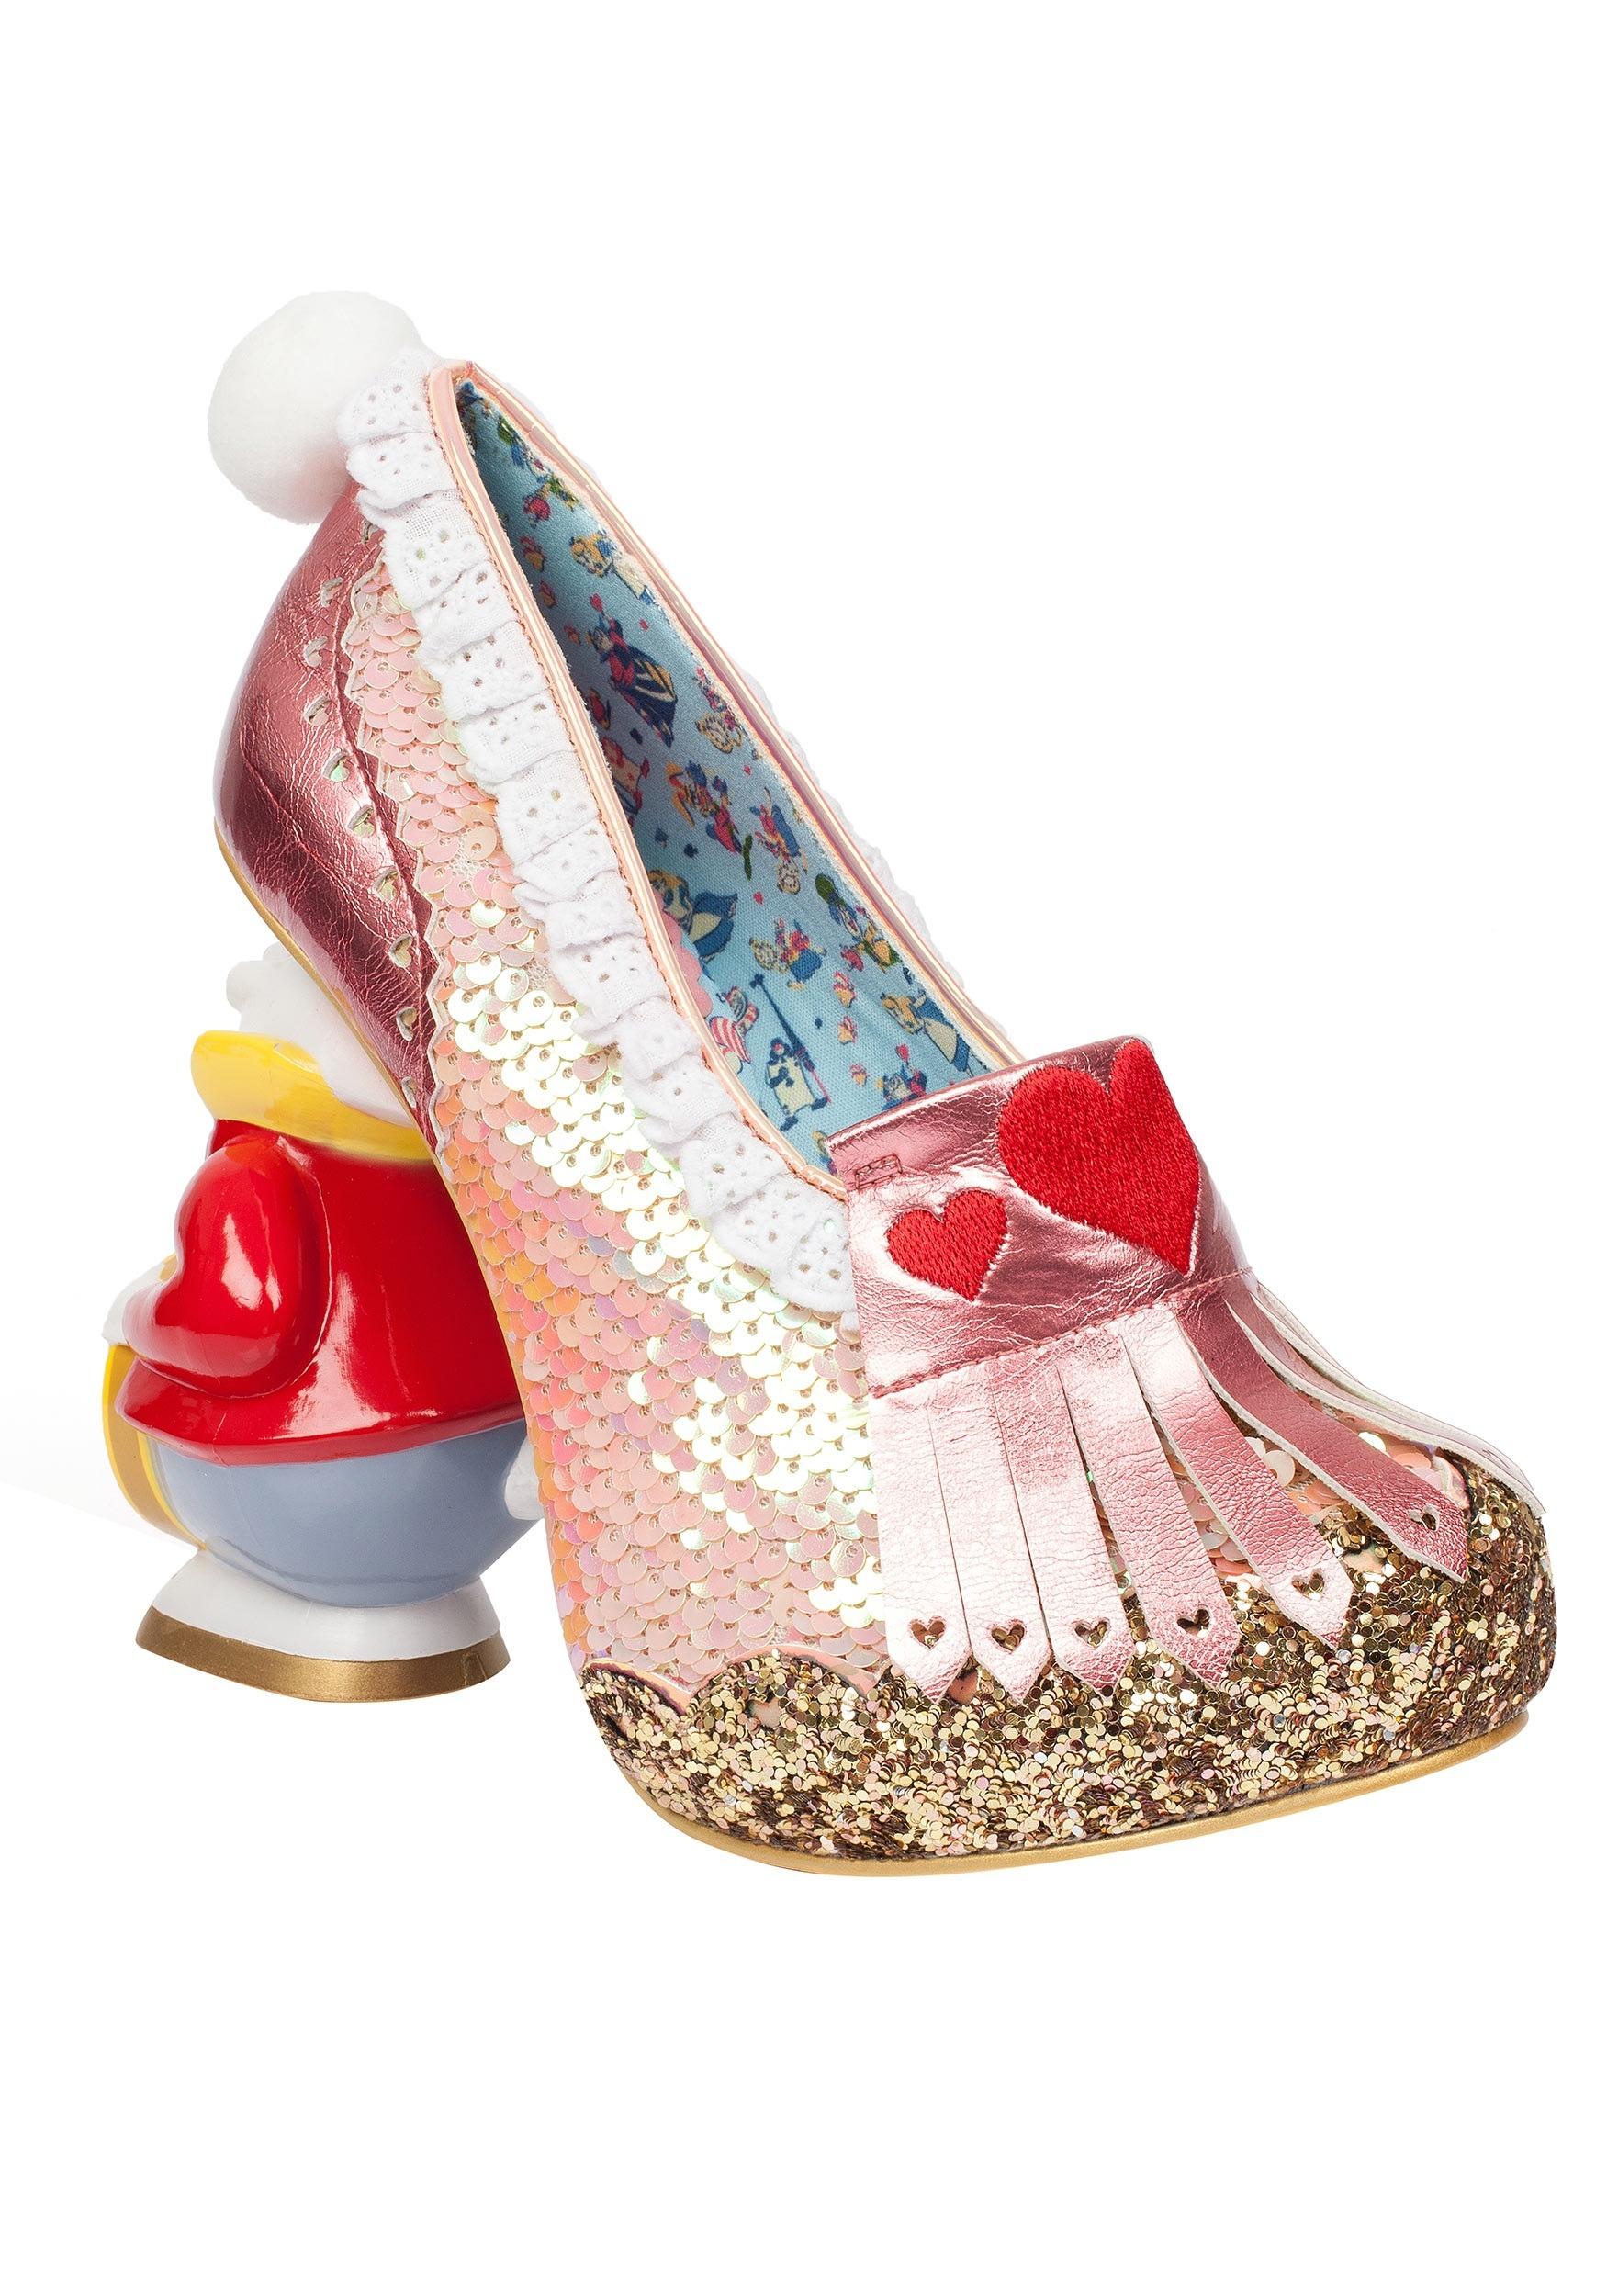 Irregular Choice Alice In Wonderland Women's White Rabbit Heels